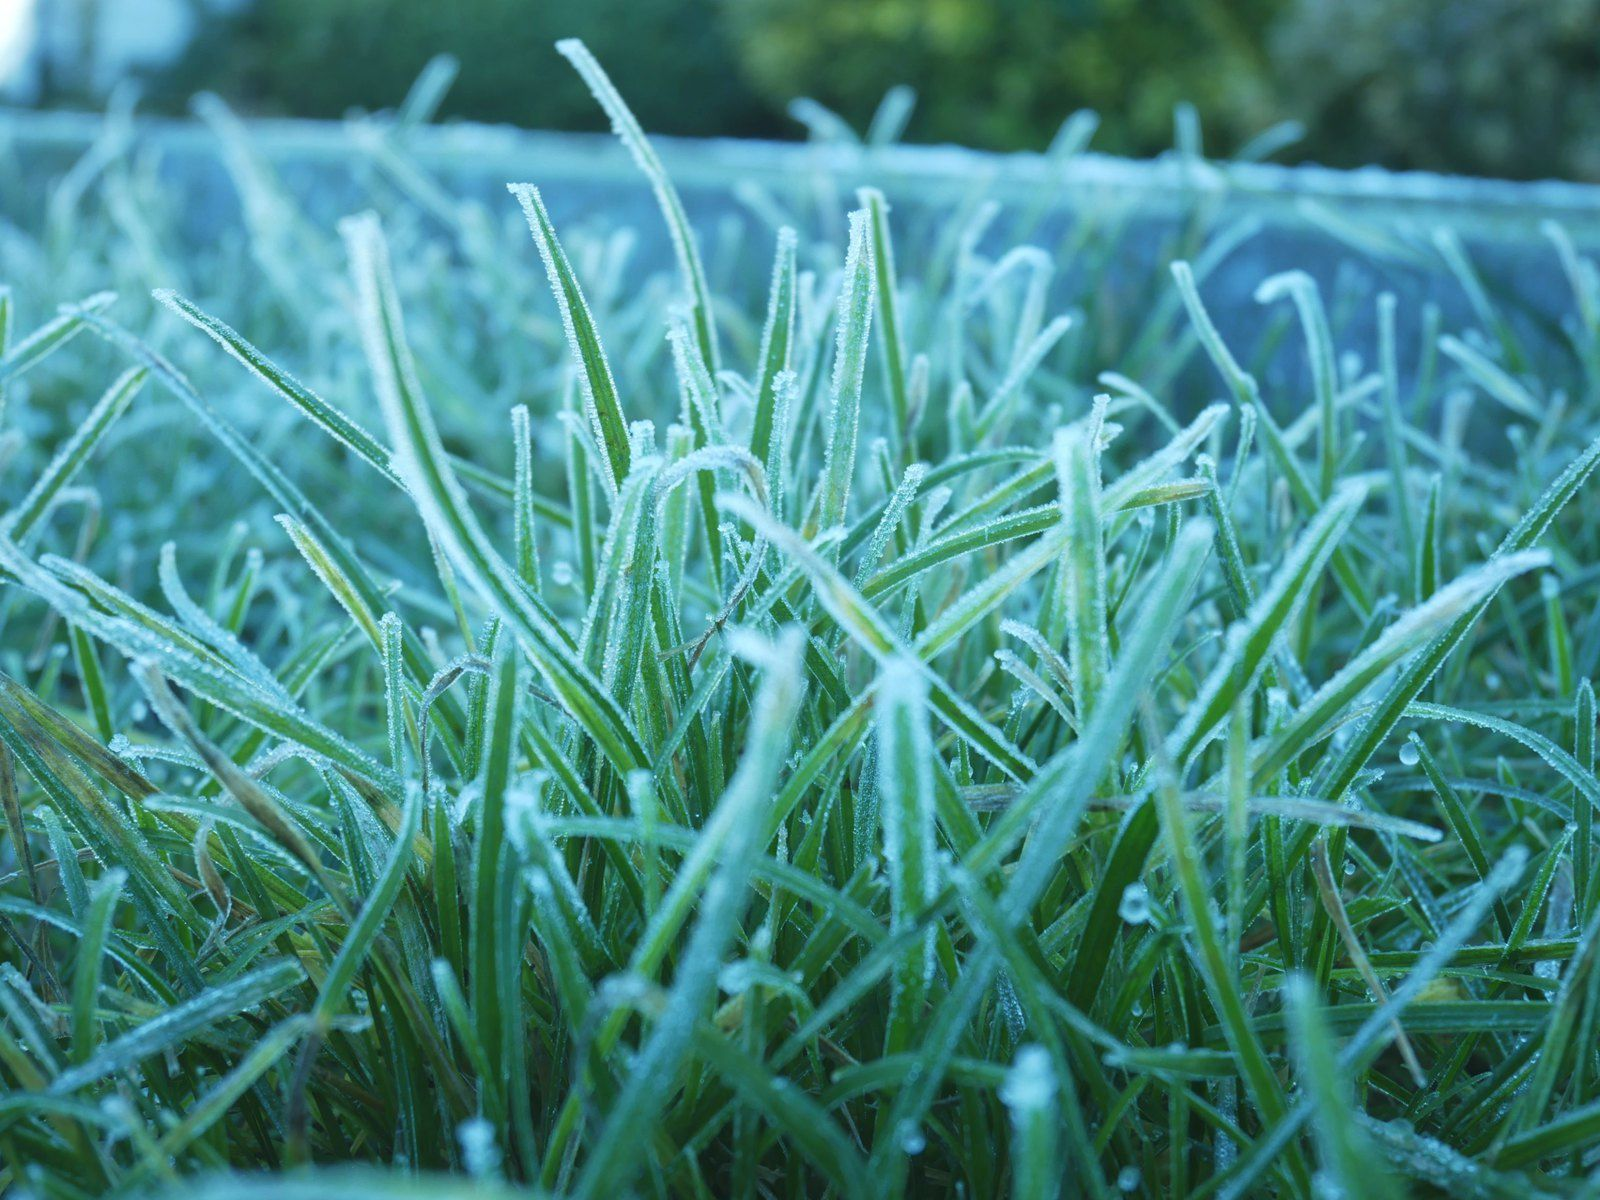 Promenade en ville, gel et brouillard: le jardin hiberne...